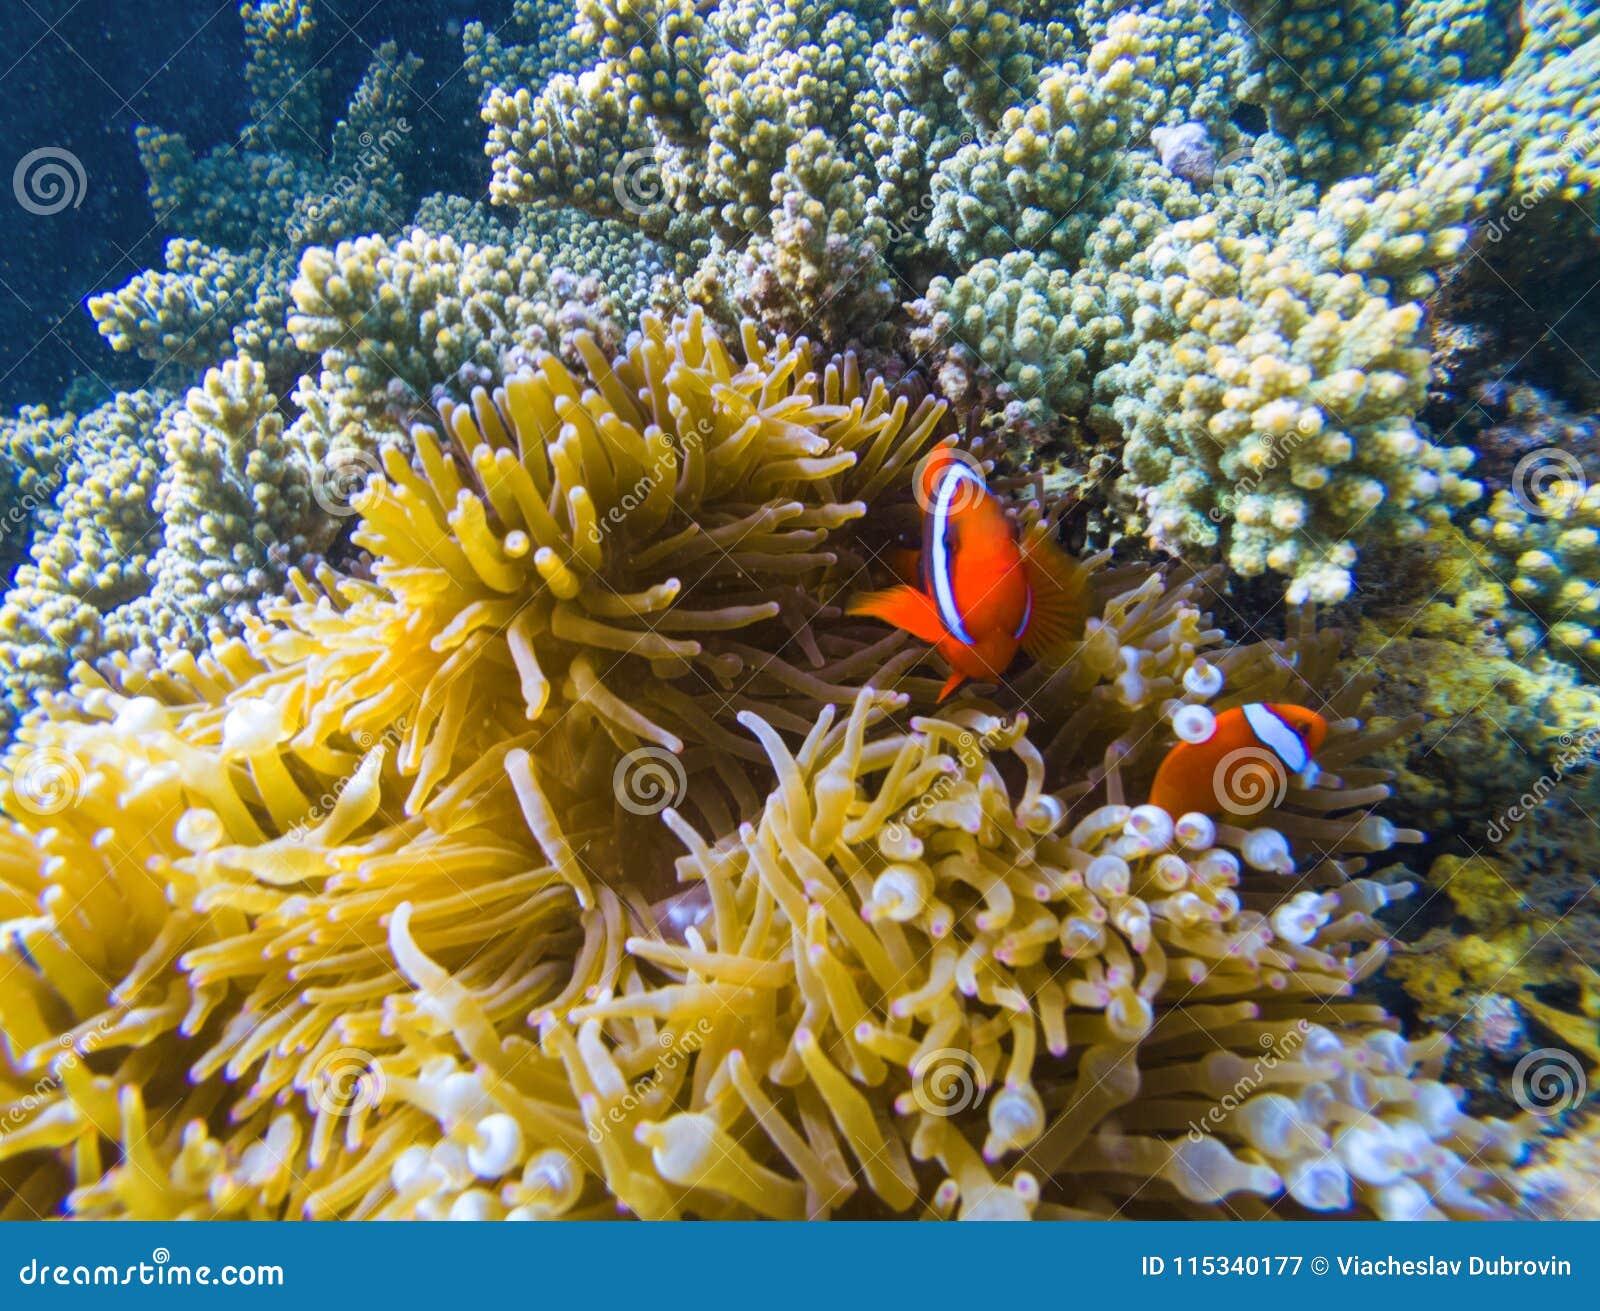 6531123ce63f Tropical Fish In Coral Reef. Orange Clownfish In Yellow Actinia ...